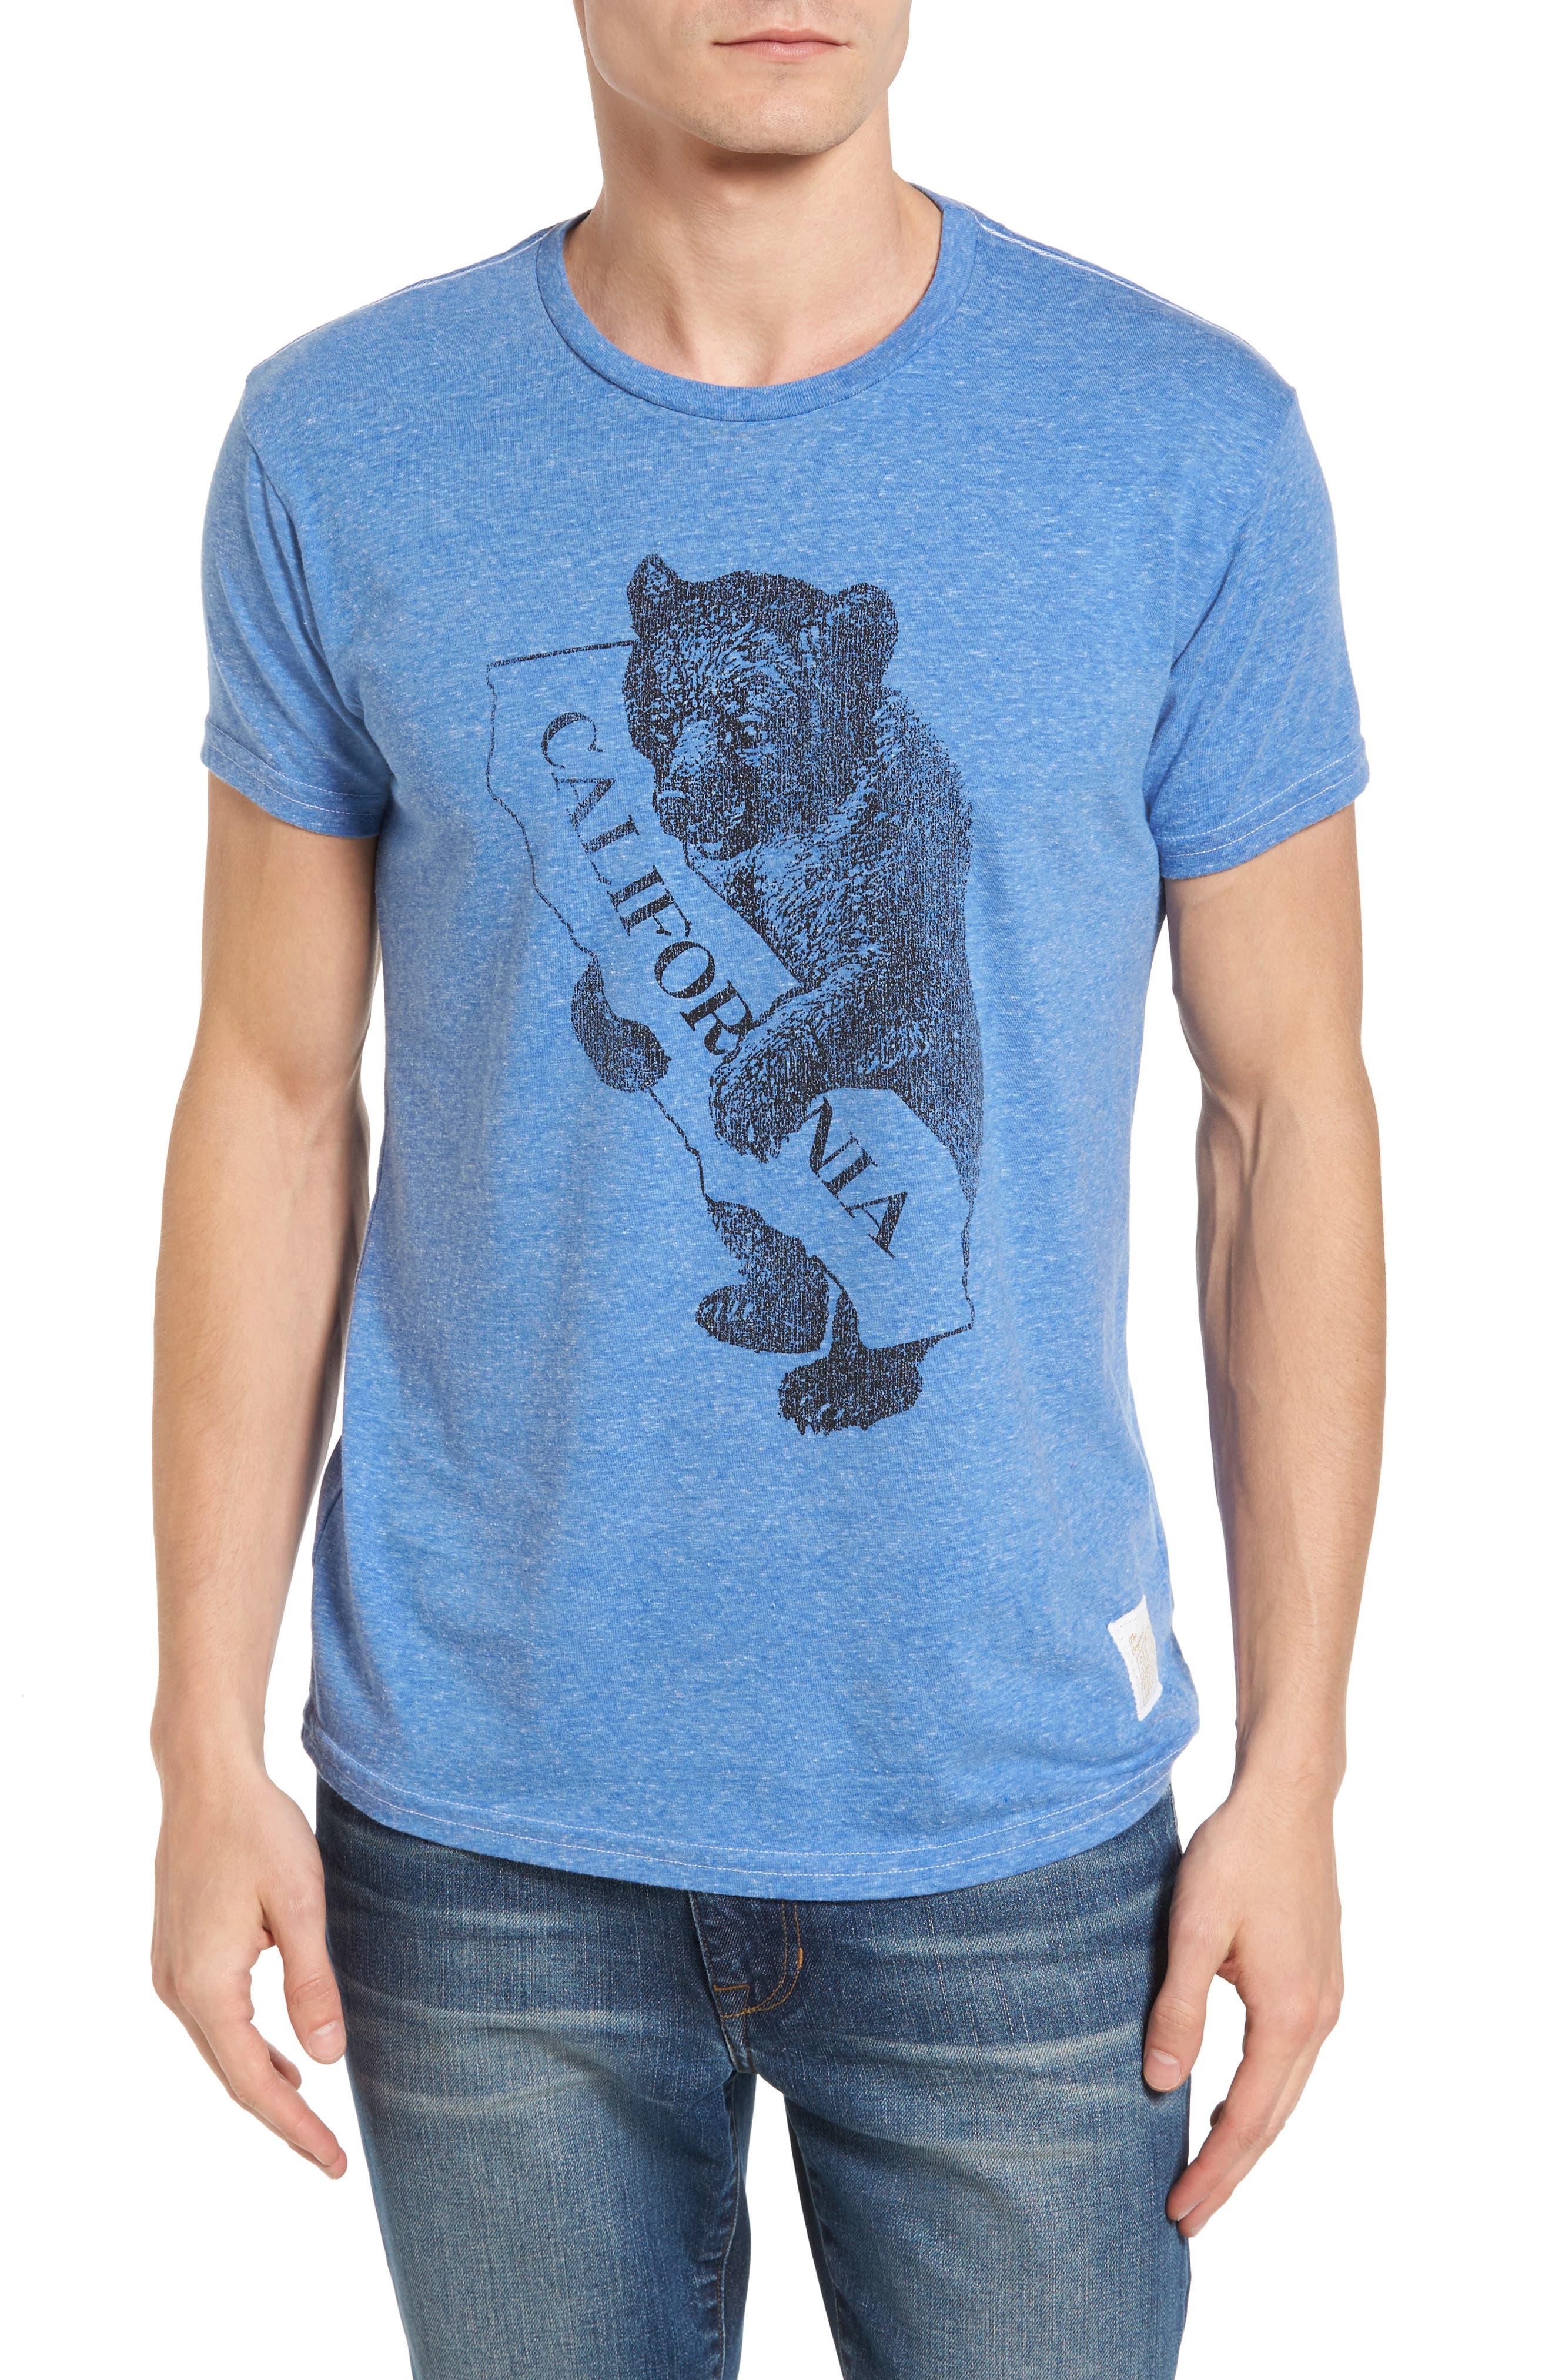 Alternate Image 1 Selected - Retro Brand California Republic T-Shirt